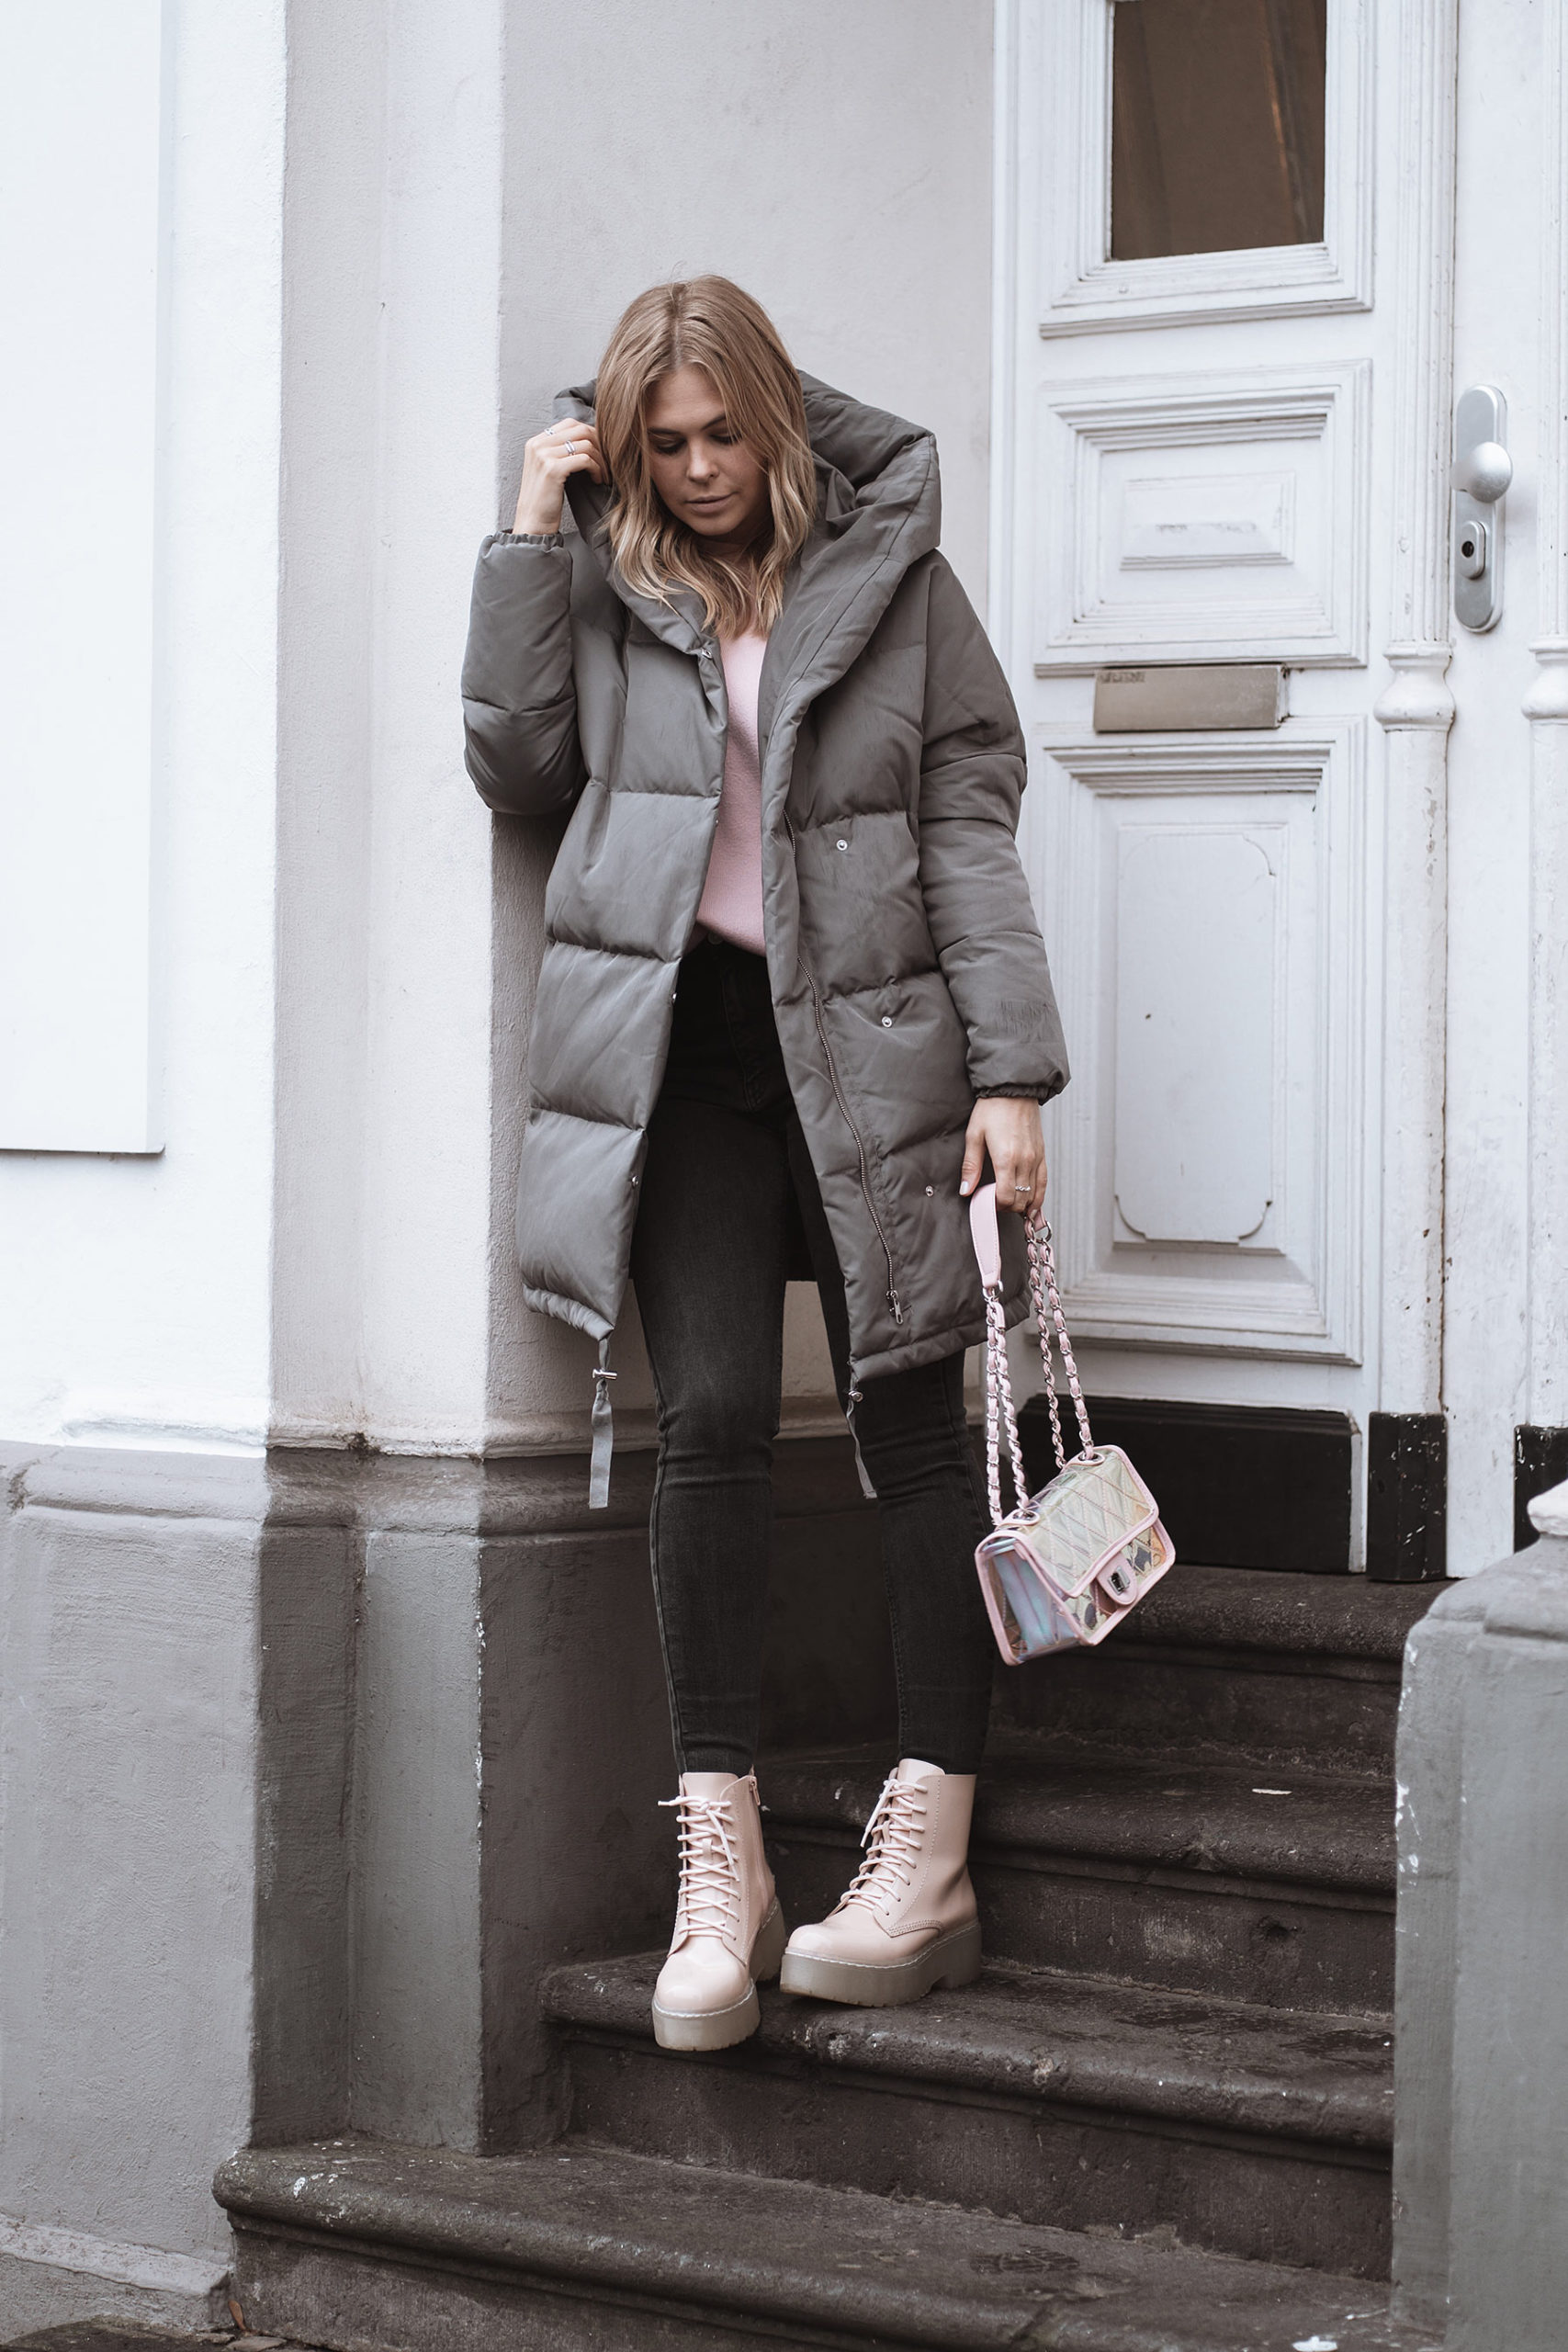 inga brauer fashion blogger oversize daunenmantel outfit